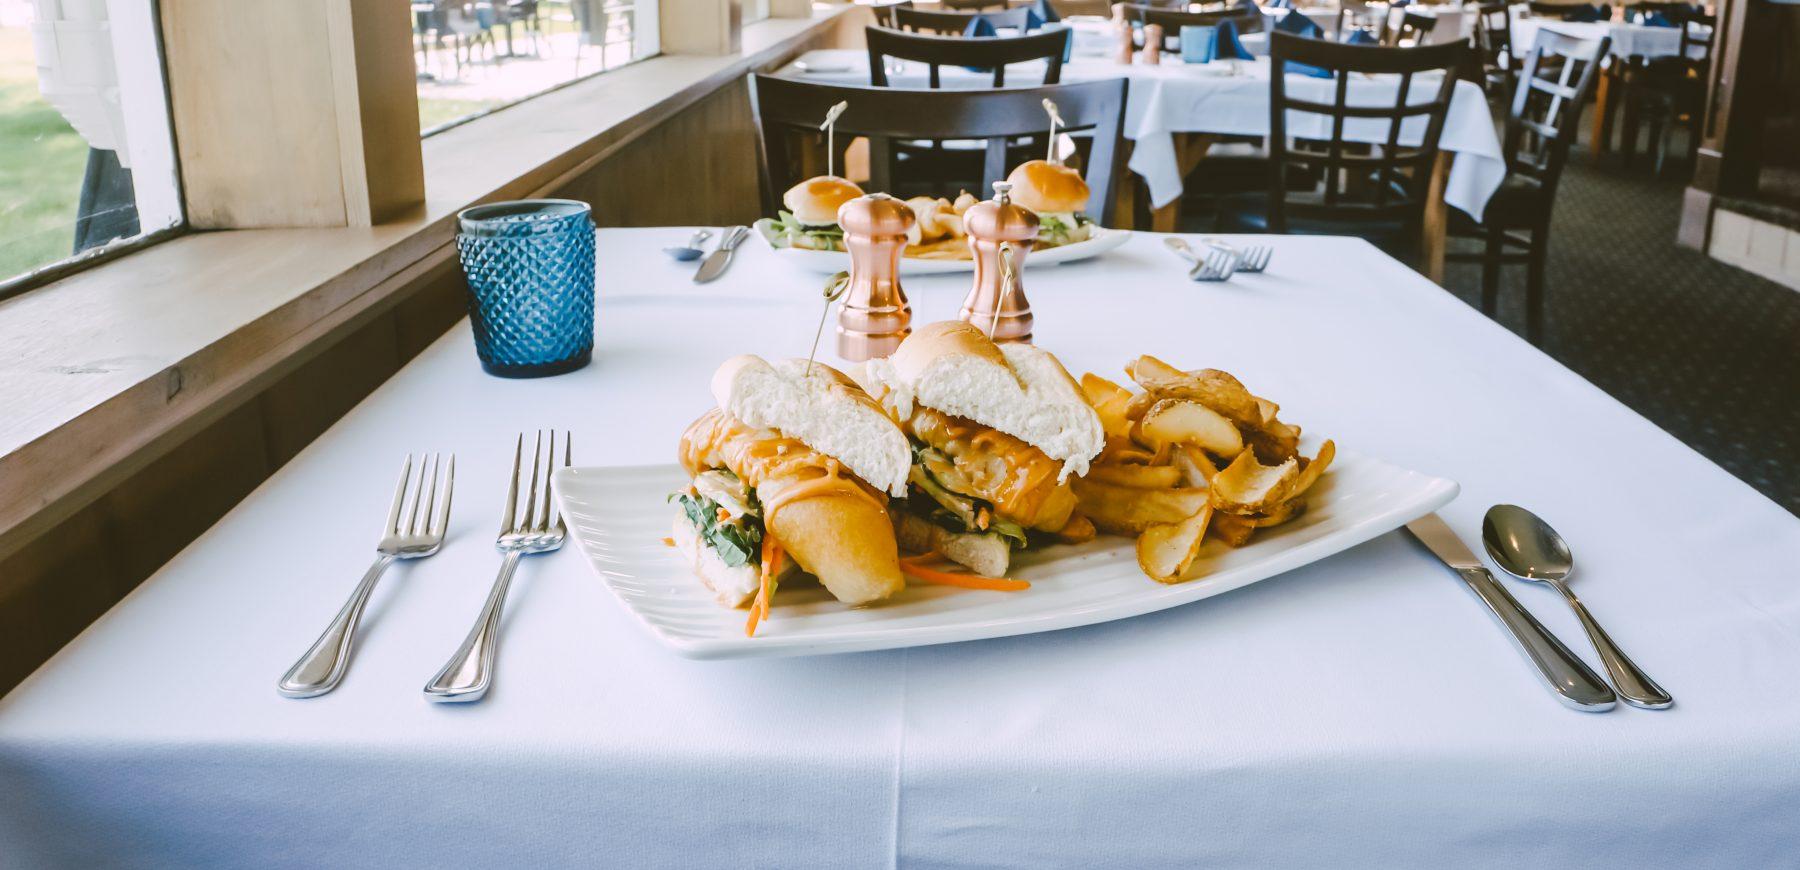 crispy cod roll sandwich with potato wedges